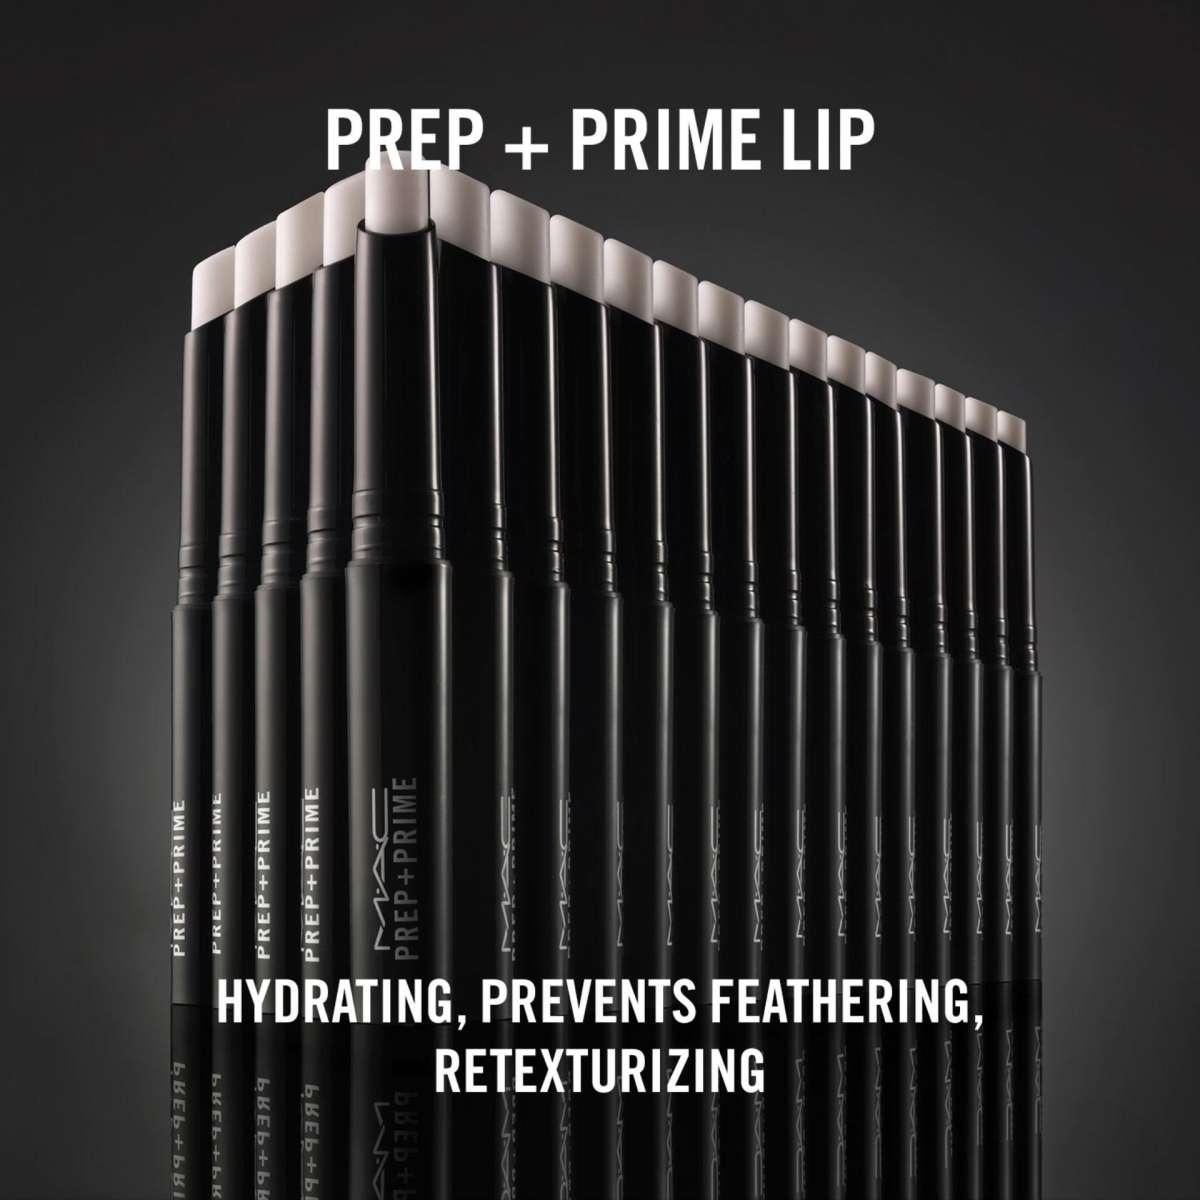 Son lót môi MAC Prep + Prime Lip 1.7g